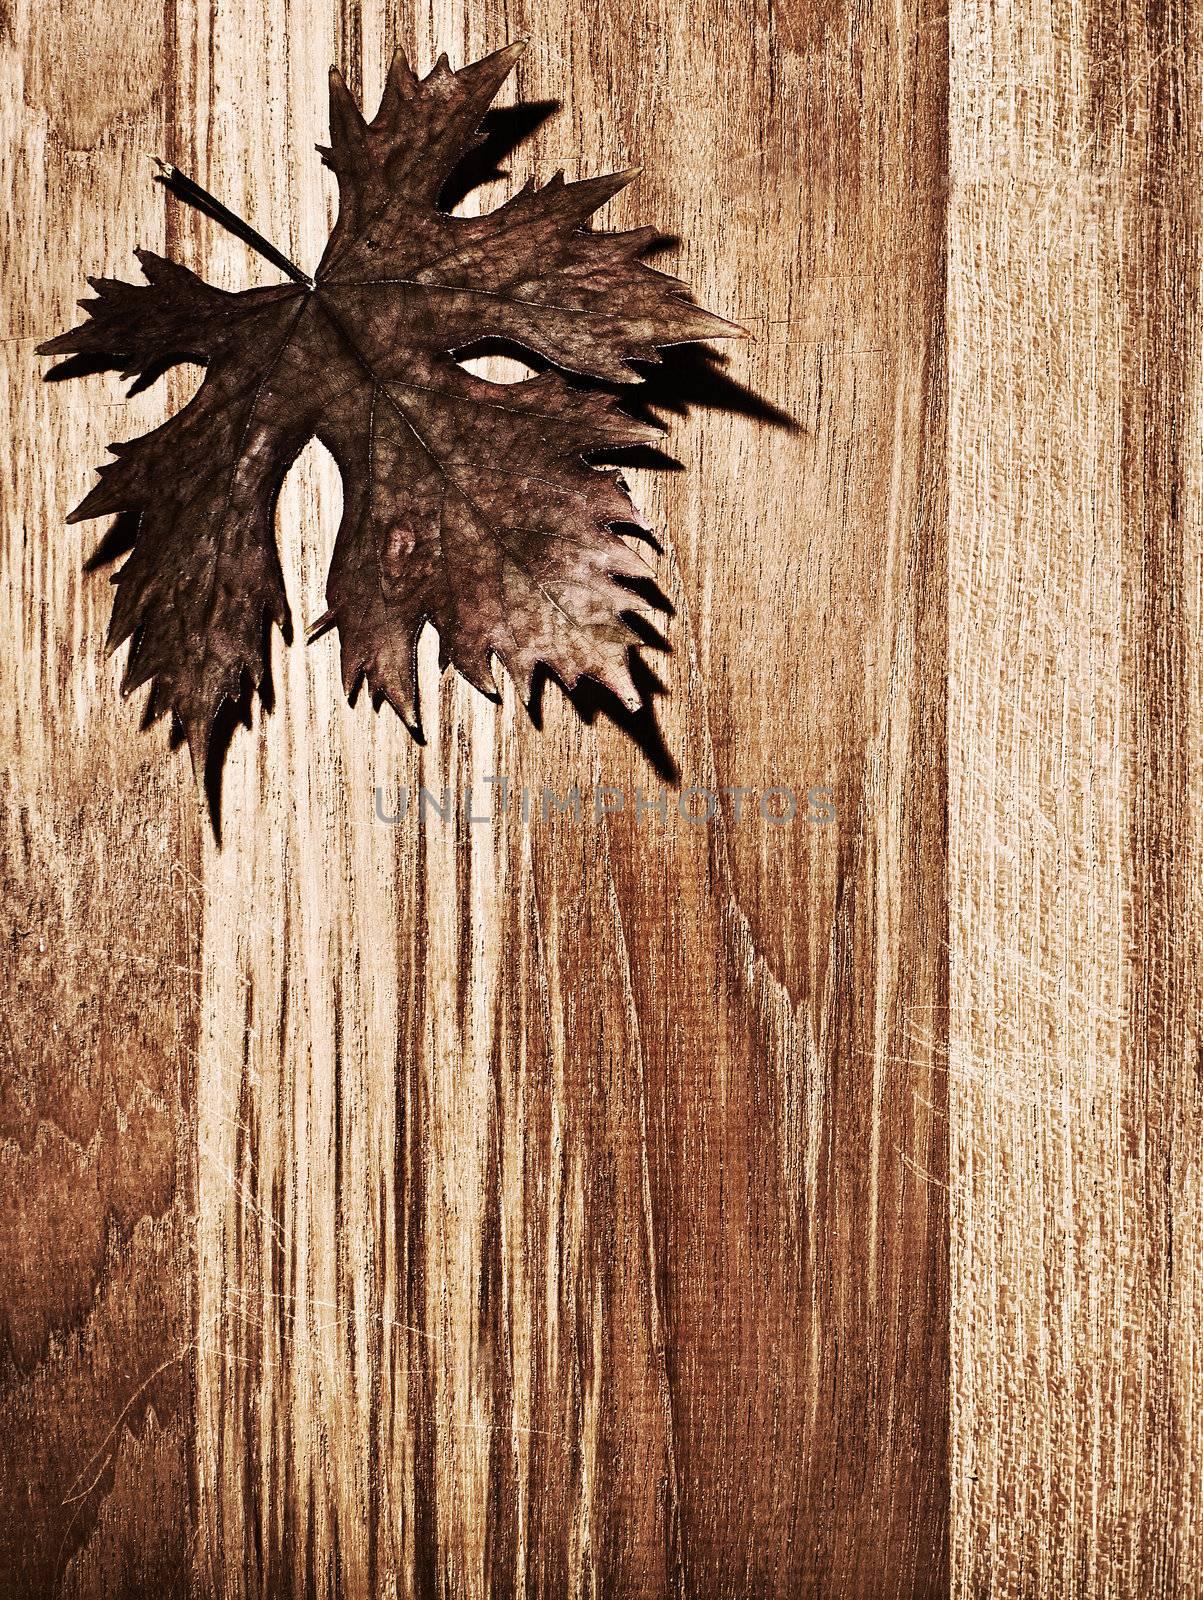 Autumn leaf  border over natural wood background, old dry leaf shape, nature at fall